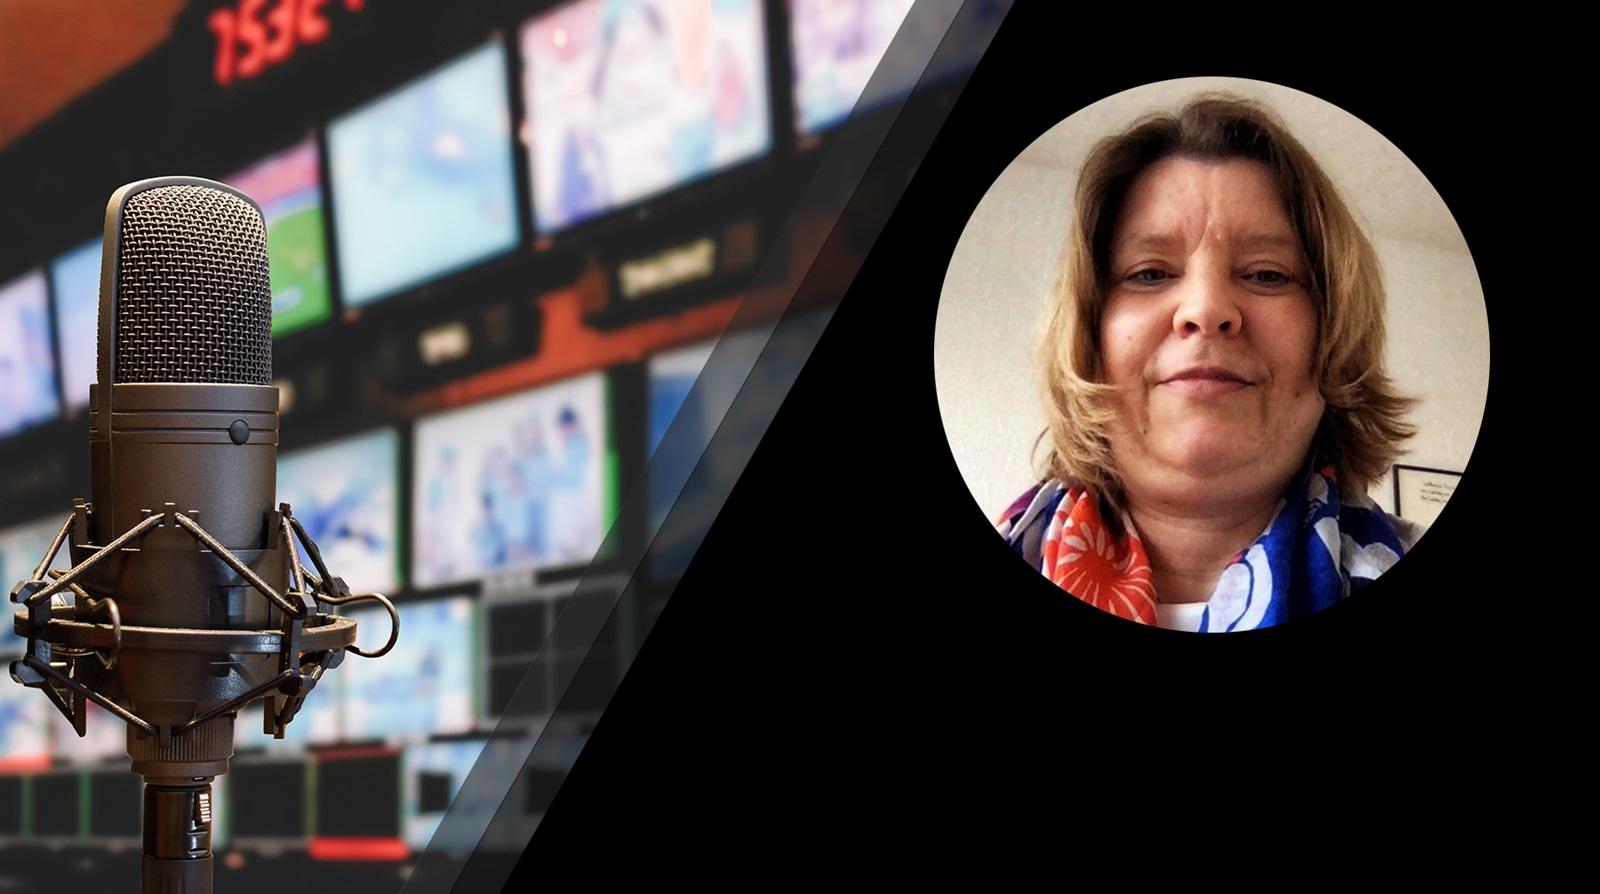 Dr. Marie Elisabeth Mueller on the Making the Media podcast